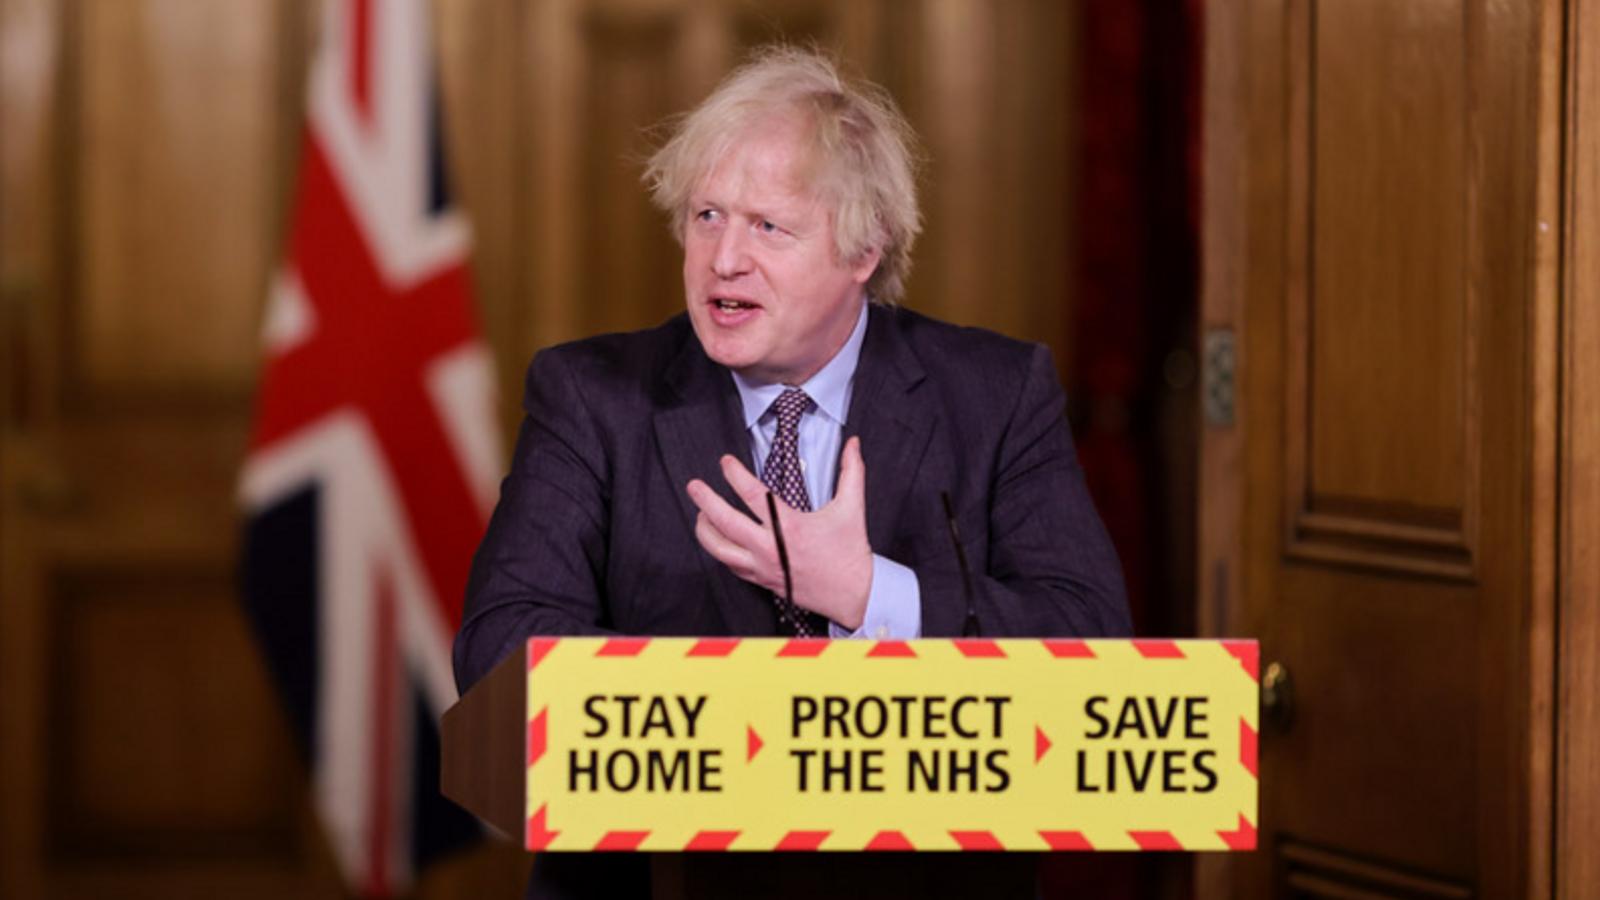 Boris Johnson Set To End Lockdown In UK By June 21st